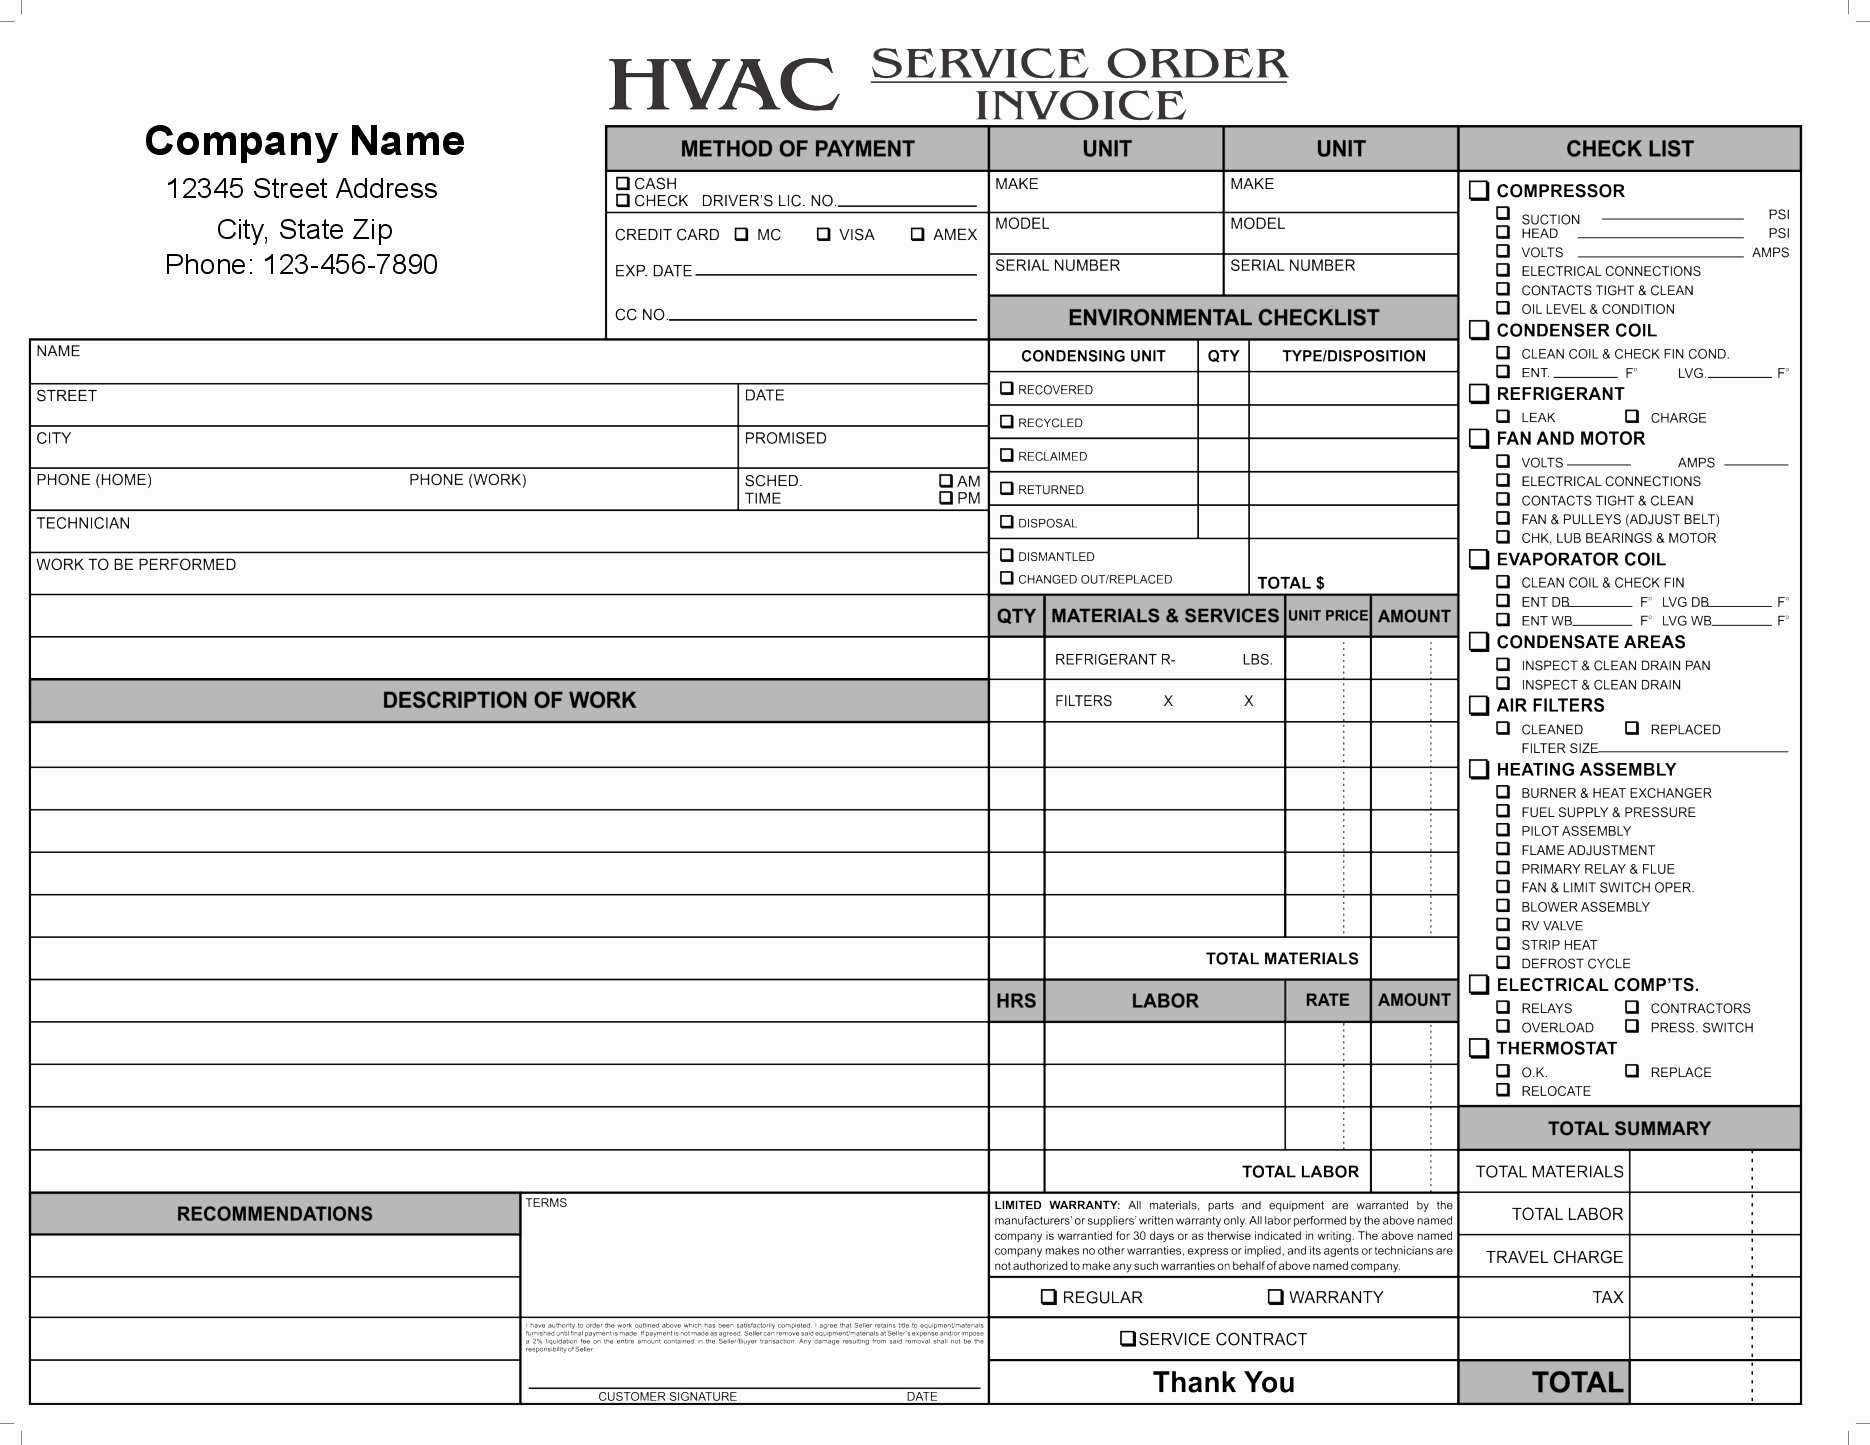 Hvac Service order Invoice Template Fresh Hvac Invoice forms Invoice Template Ideas